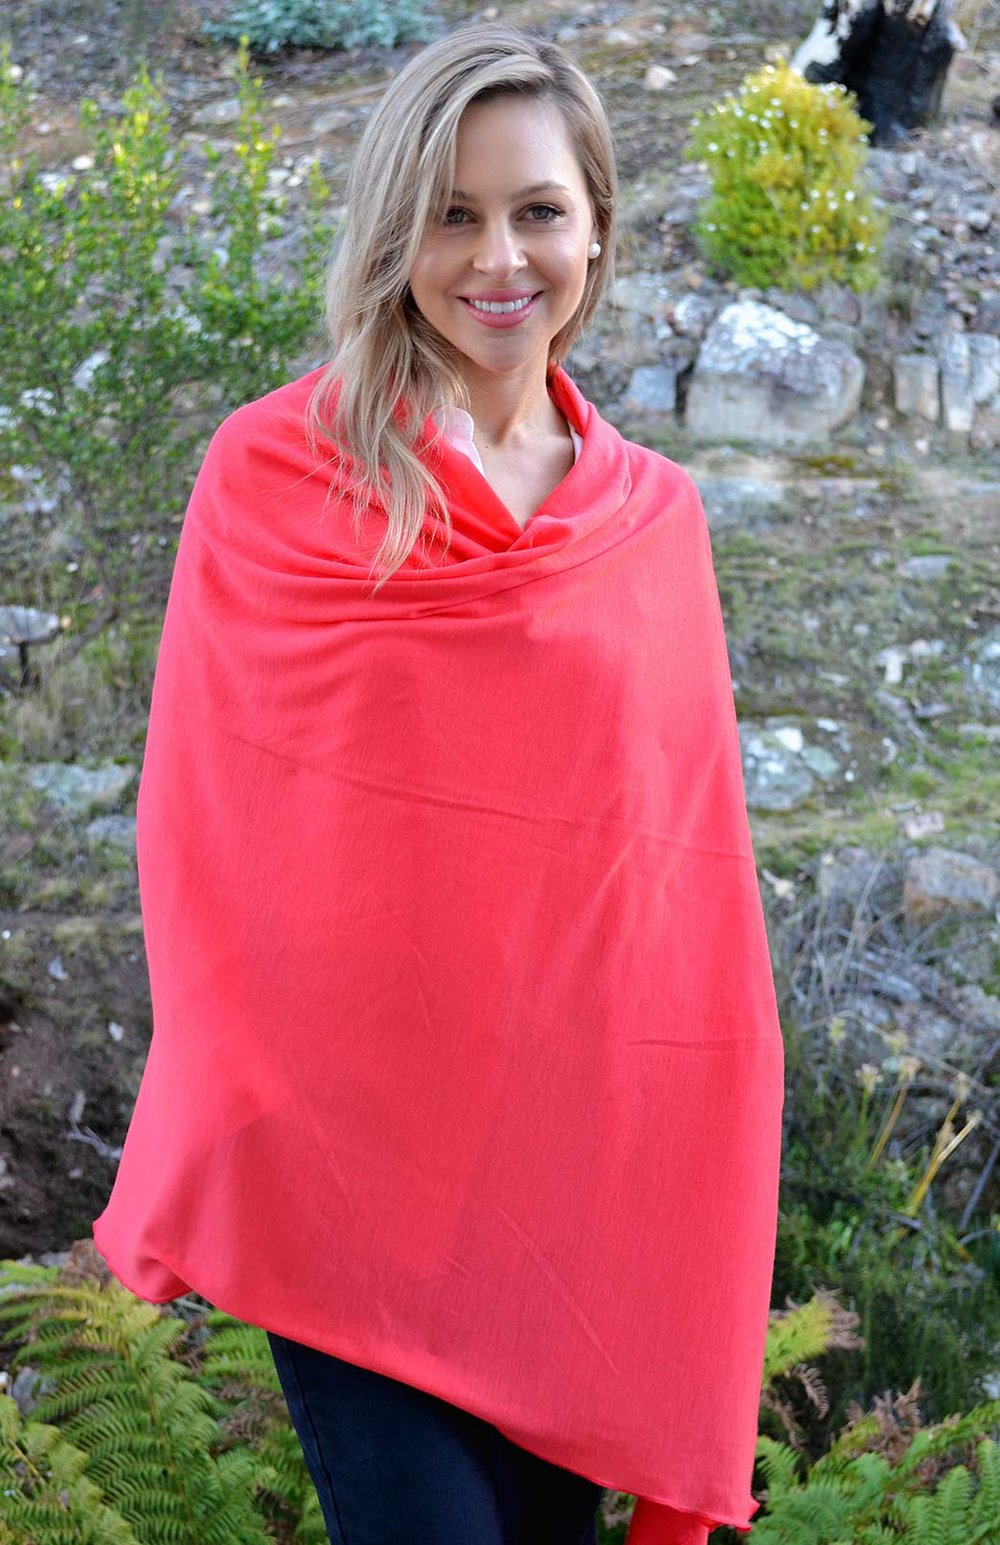 8404-wide-merino-scarf-salmon-pink-03-hero-1.jpg